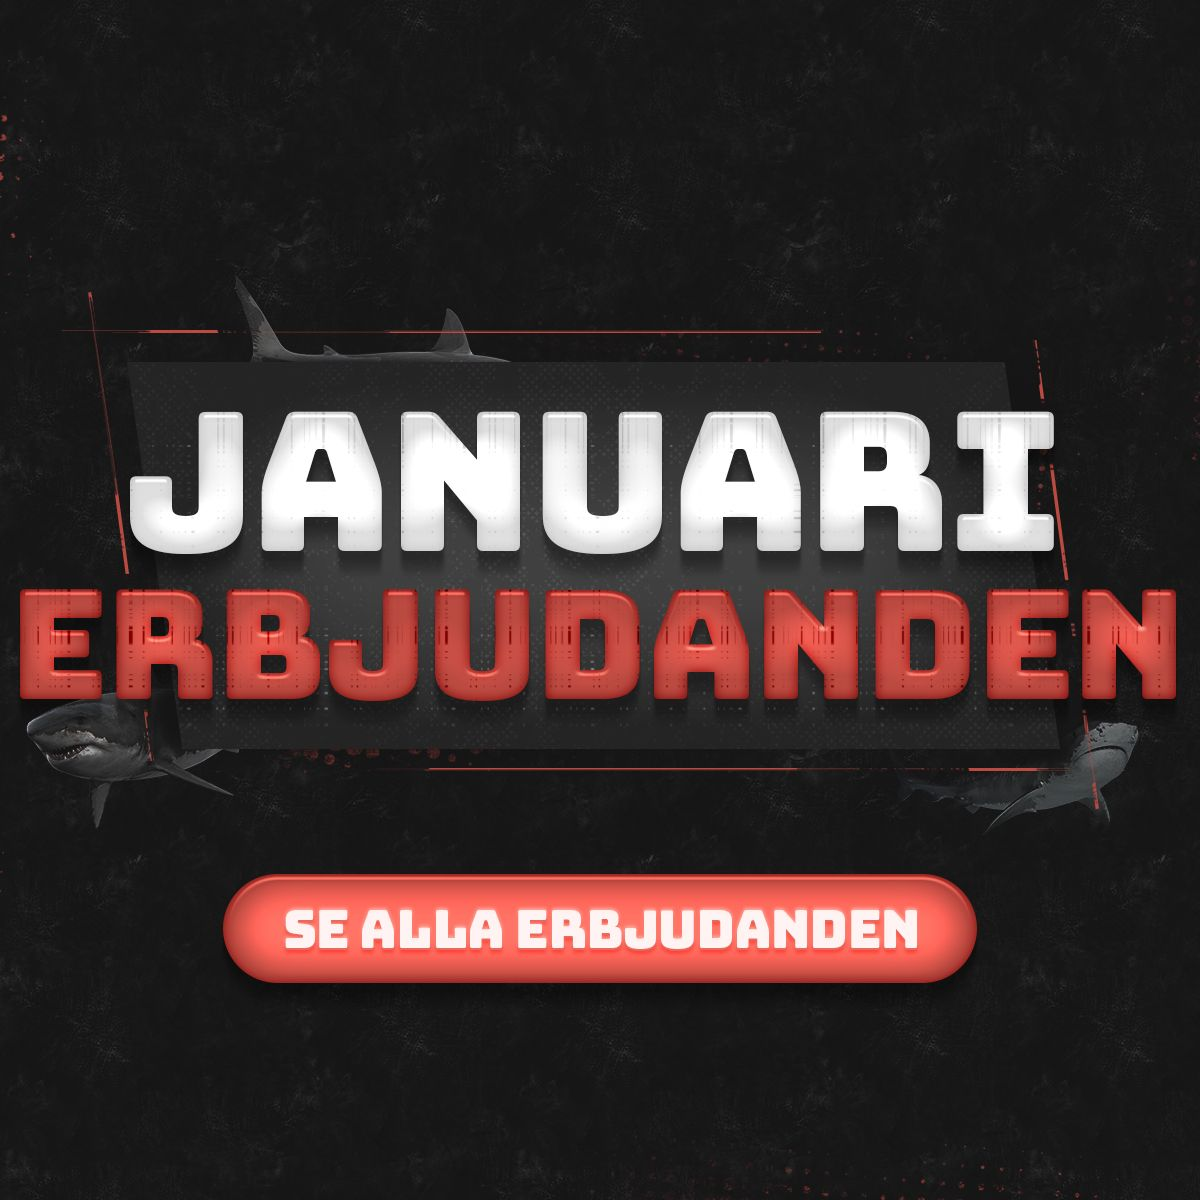 Januari erbjudanden